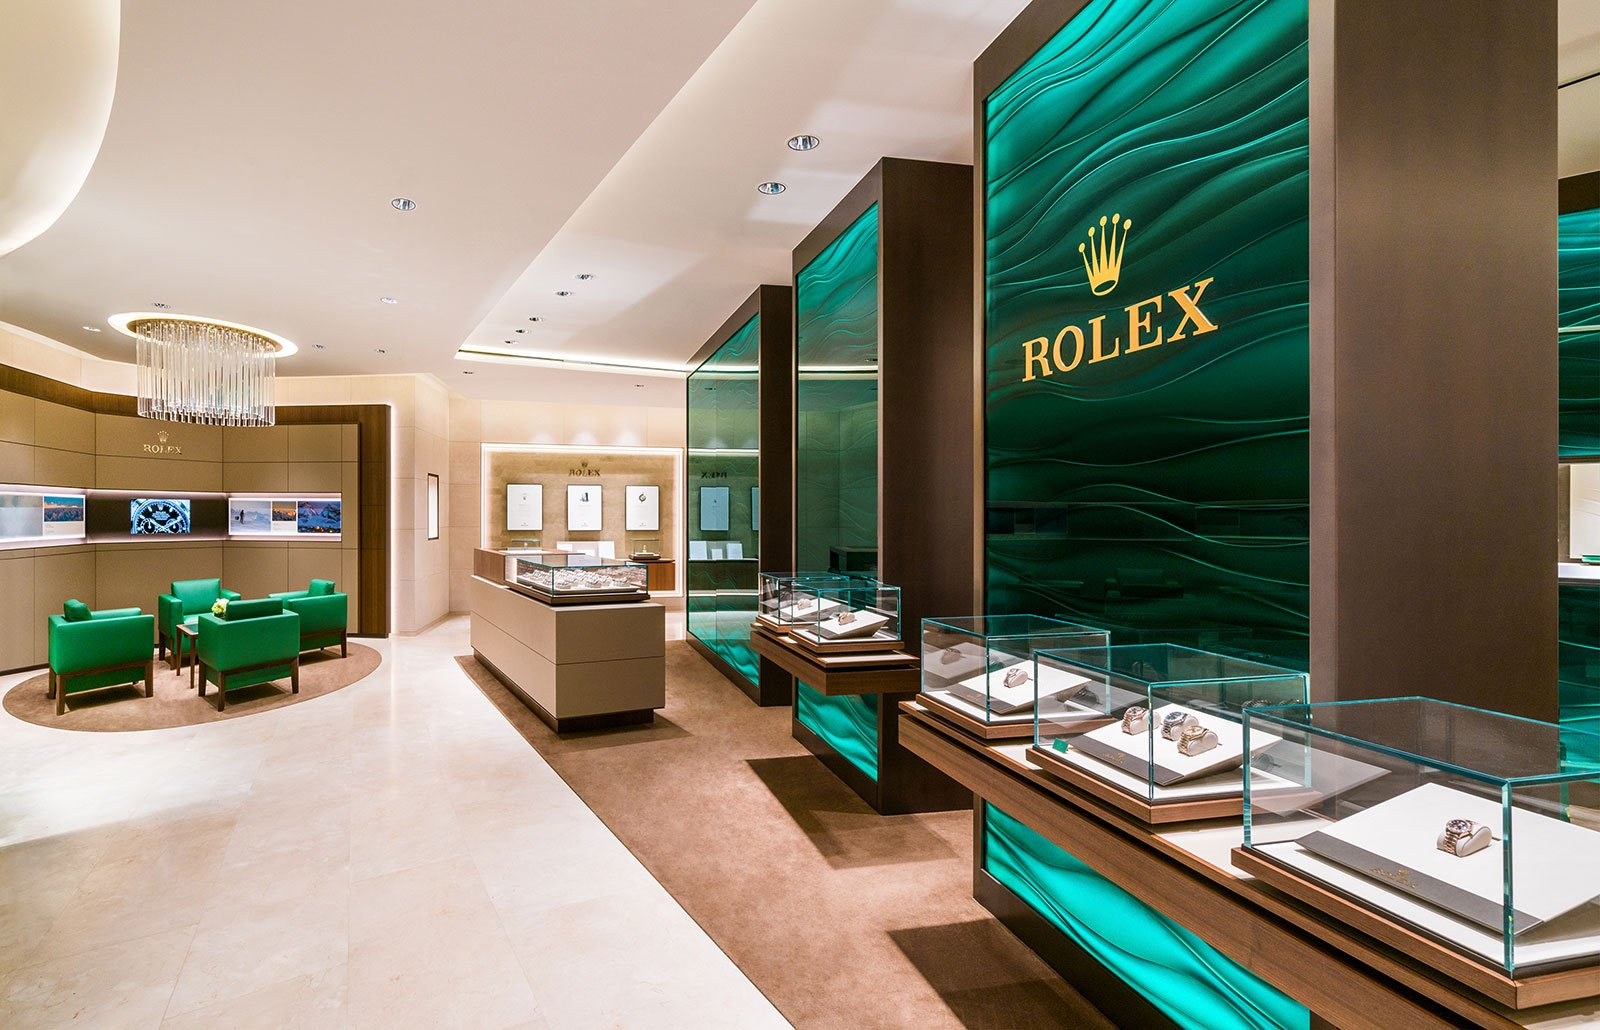 Rolex inaugura la mayor tienda de Singapur